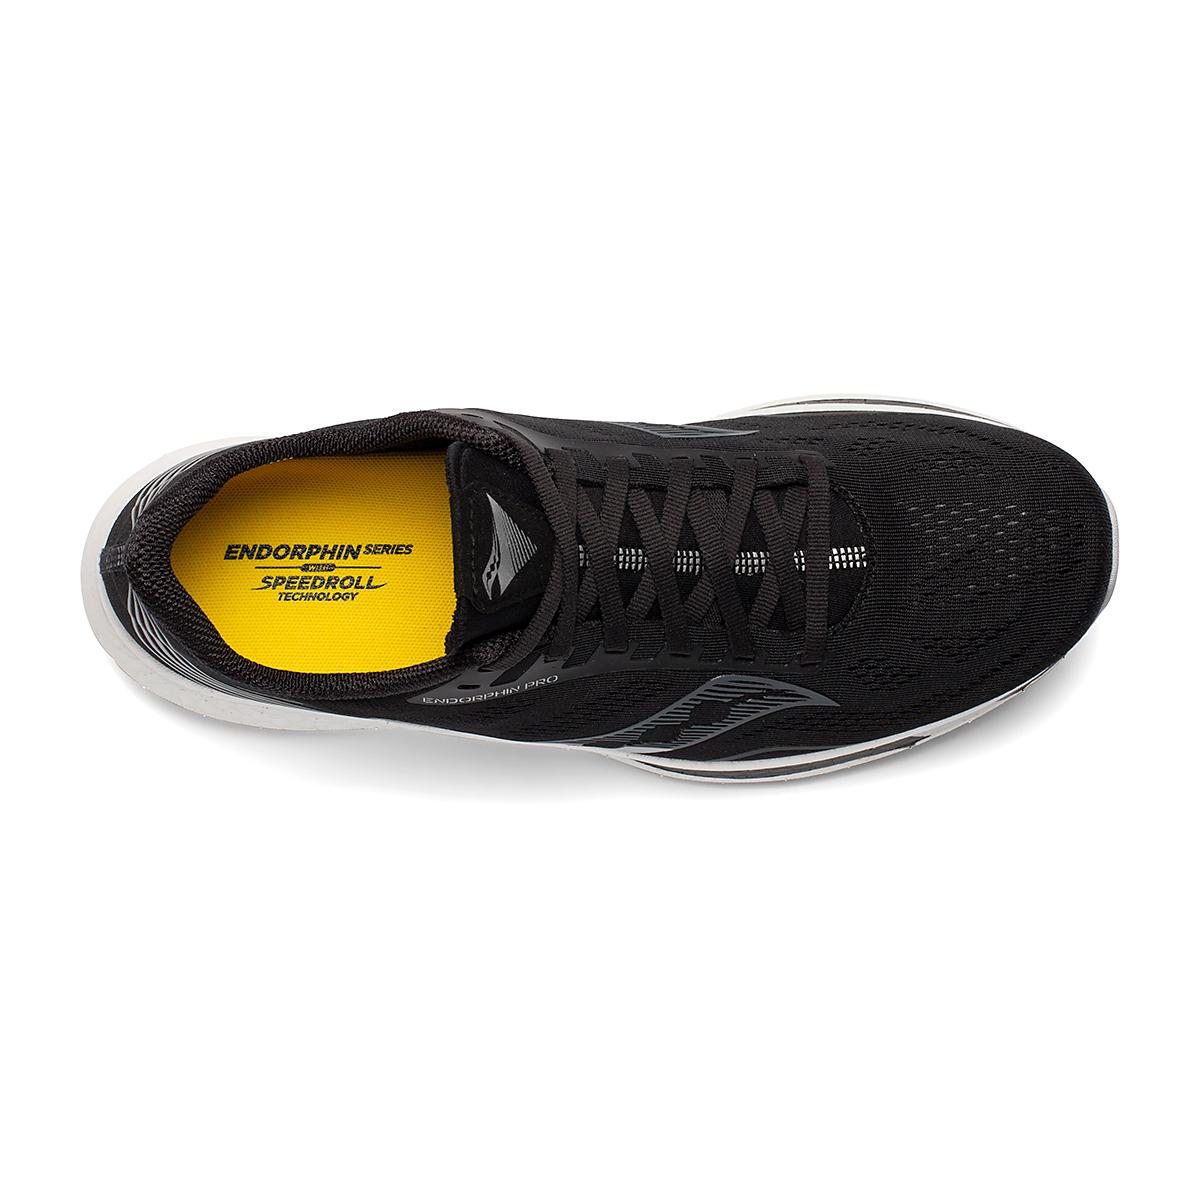 Men's Saucony Endorphin Pro Running Shoe - Color: Black/Silver - Size: 7 - Width: Regular, Black/Silver, large, image 4